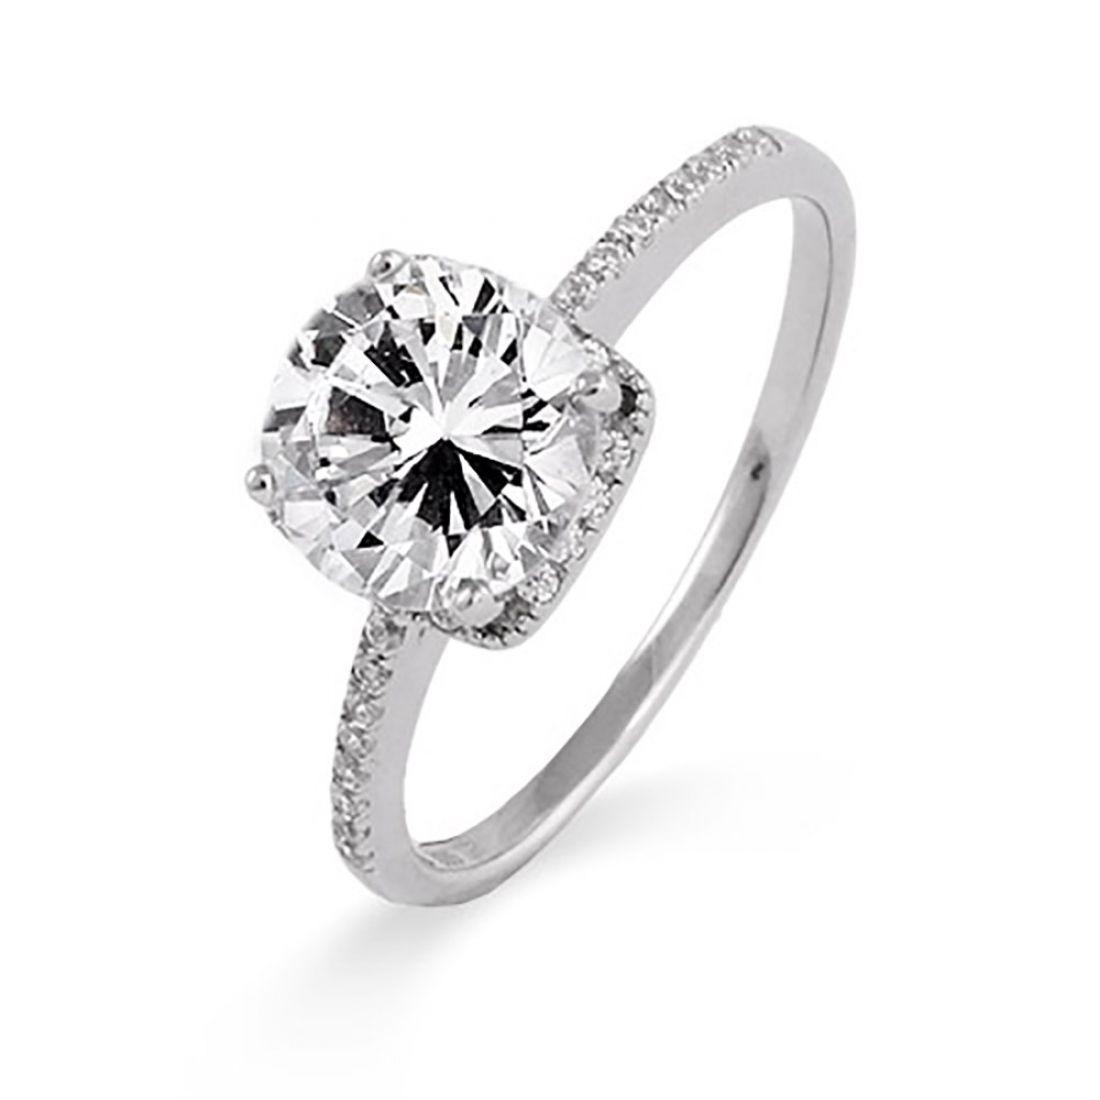 31 Beautiful Fake Diamond Wedding Rings That Look Real